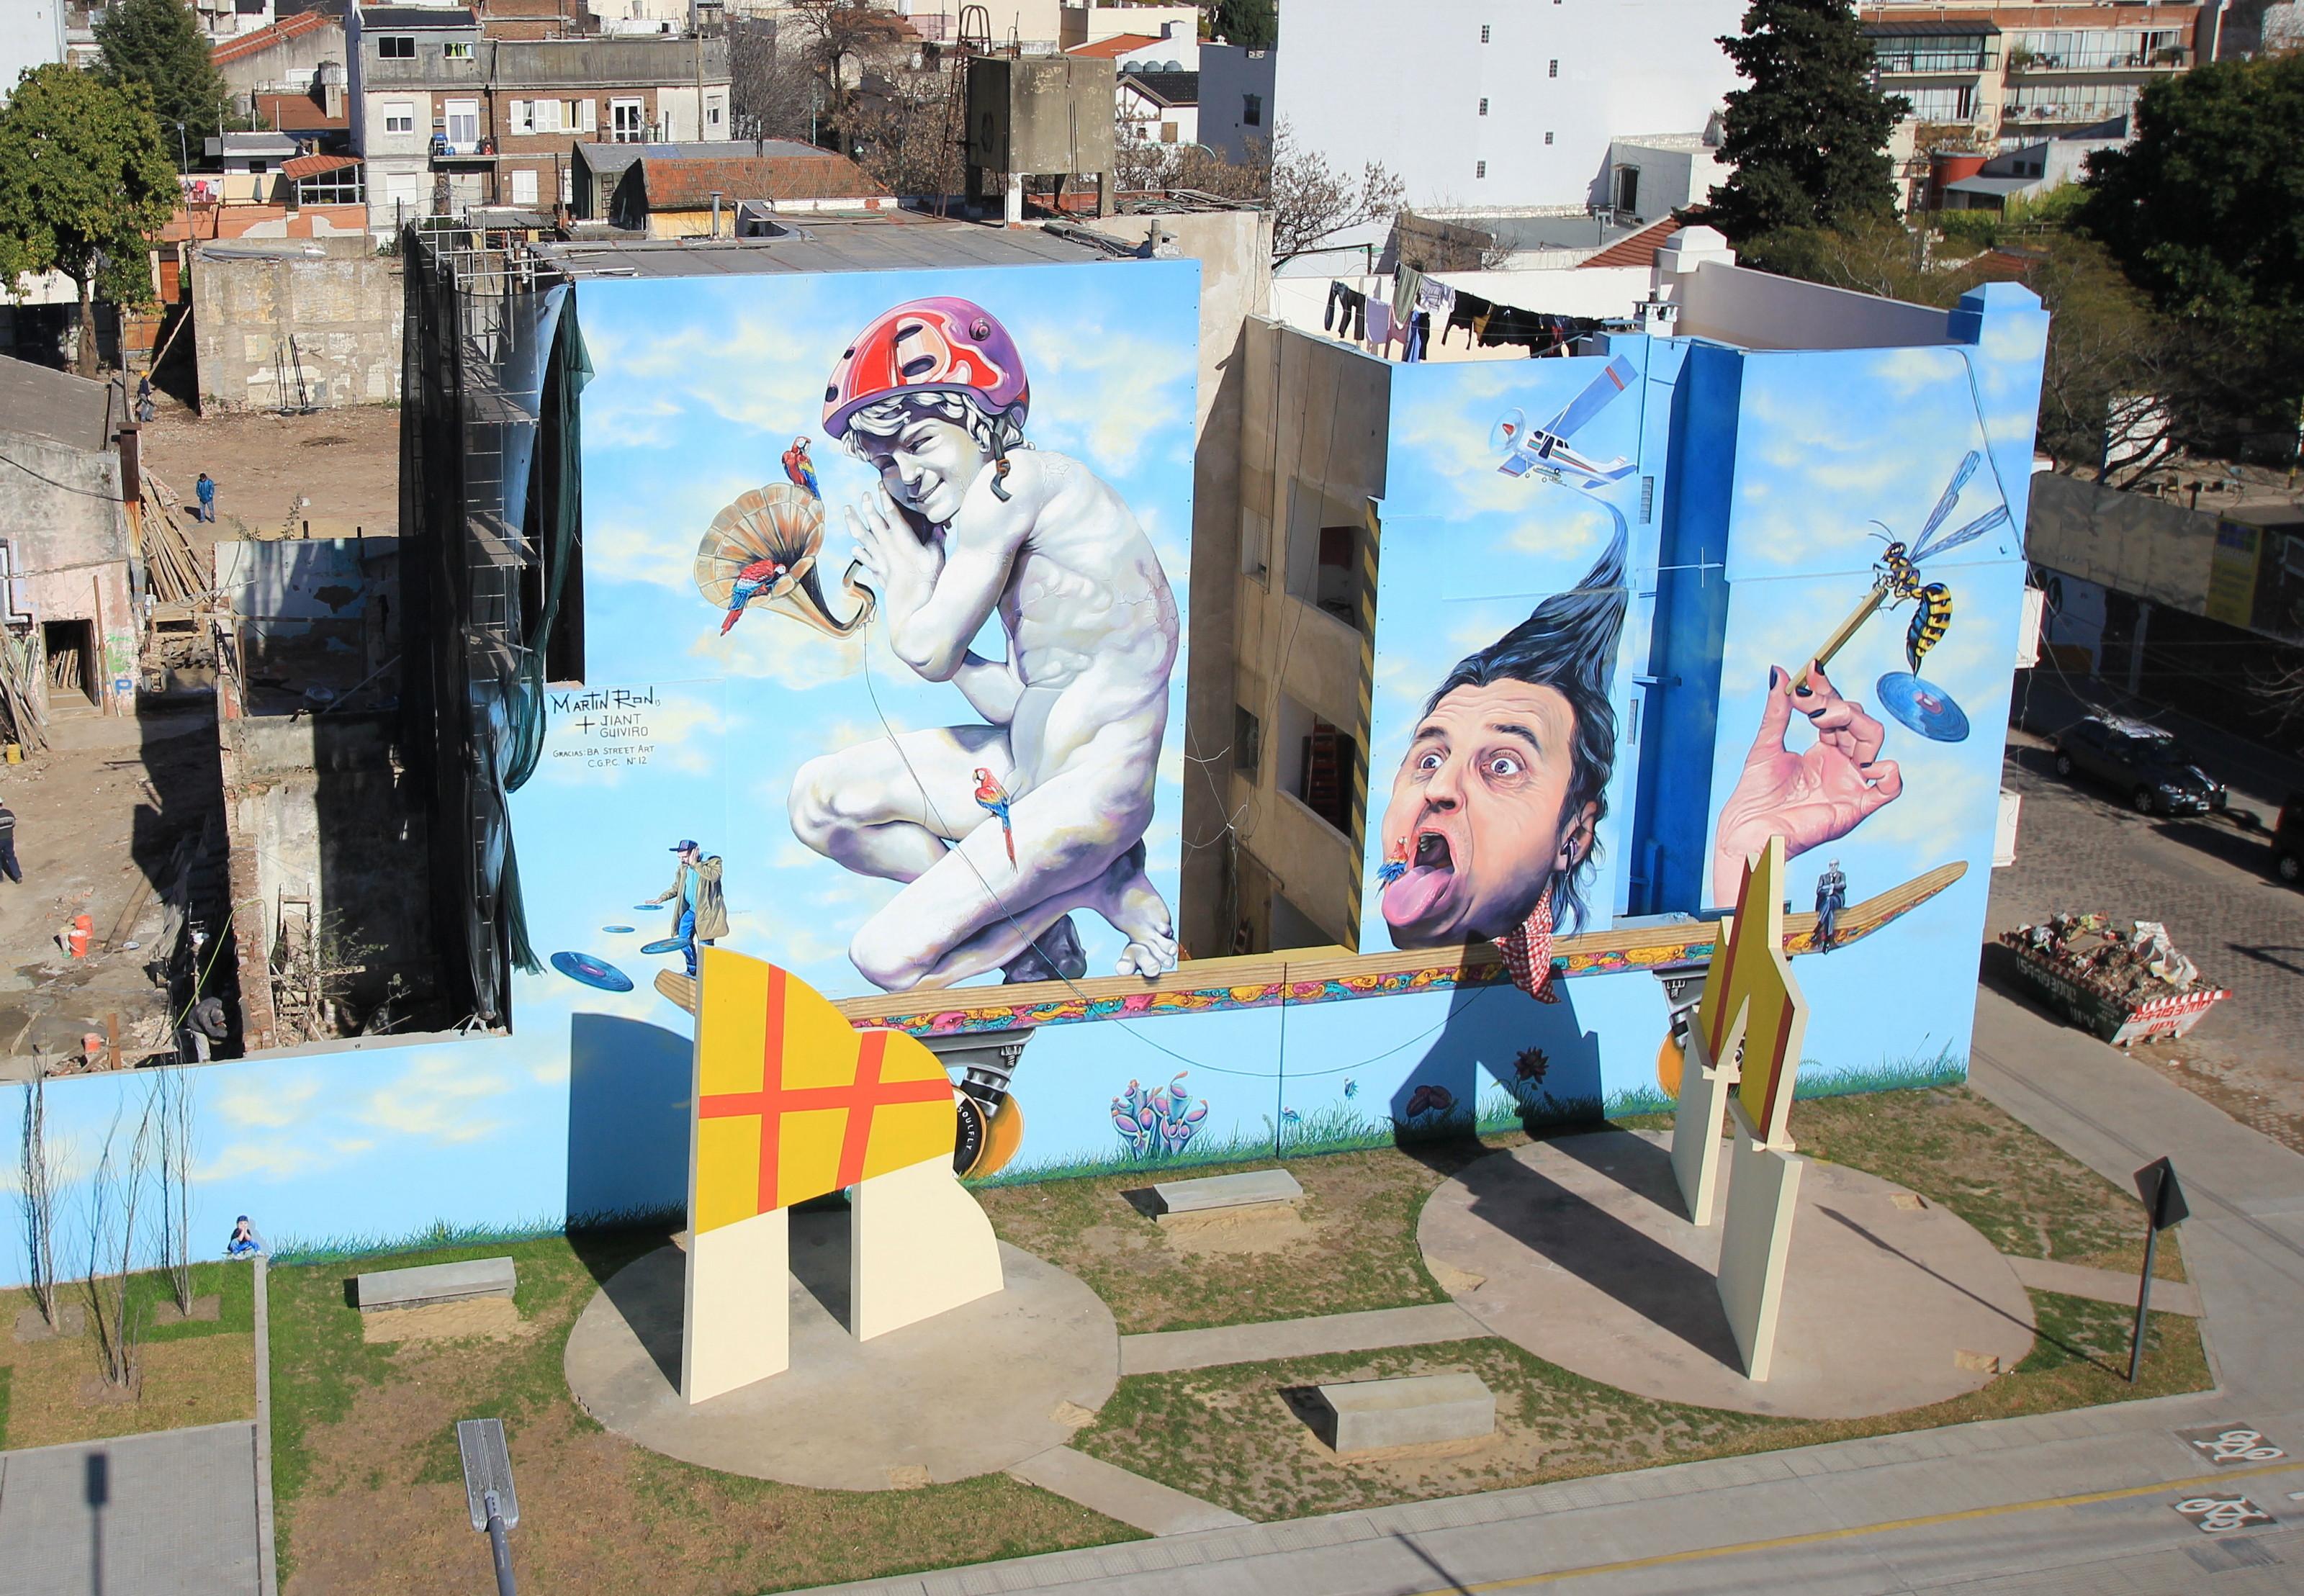 mural mas grande buenos aires graffiti tour project organised by Buenos Aires Street Art arte urbano ciudad mas grande